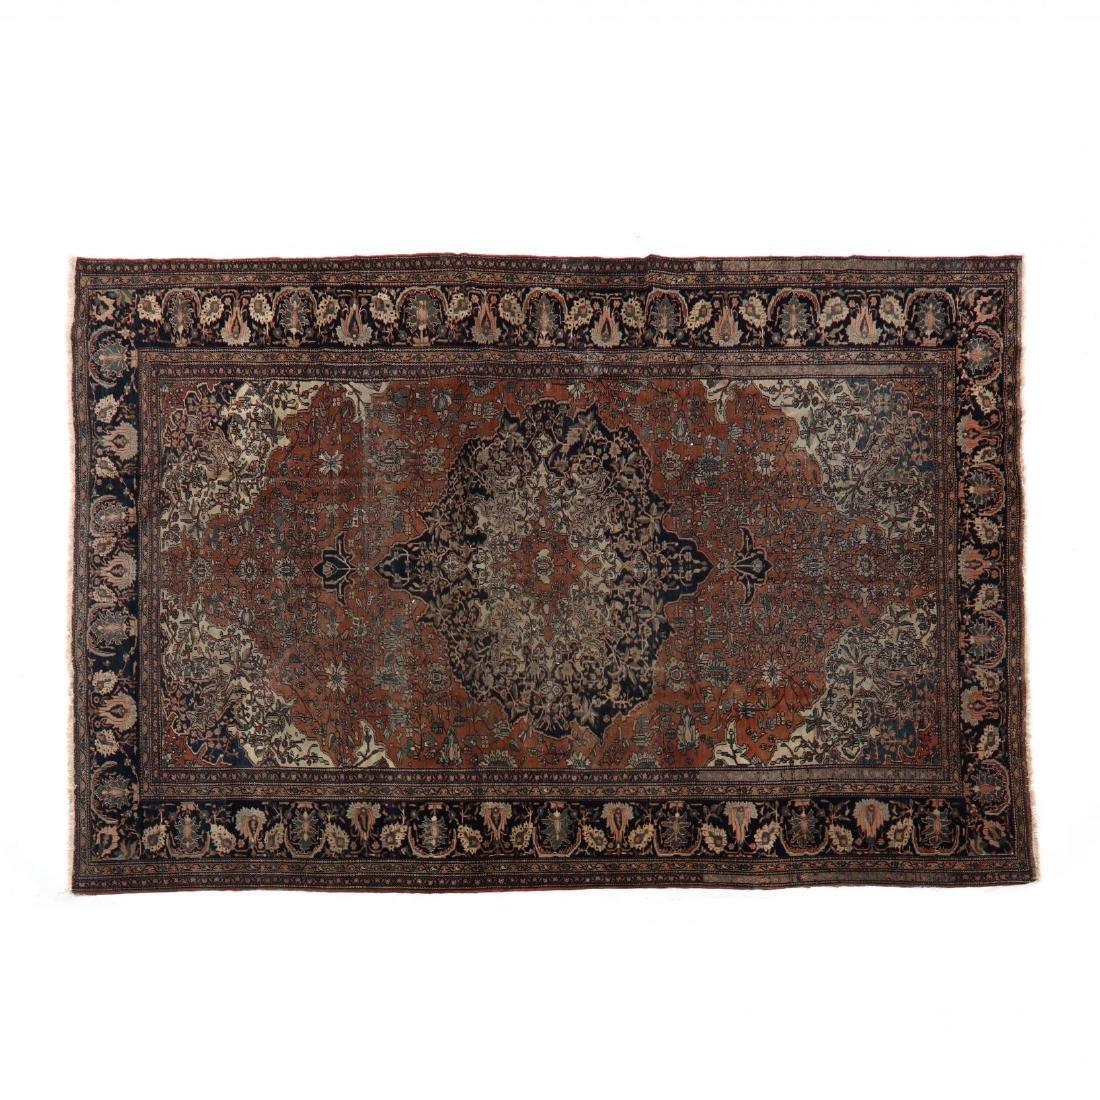 Antique Feraghan Sarouk Carpet